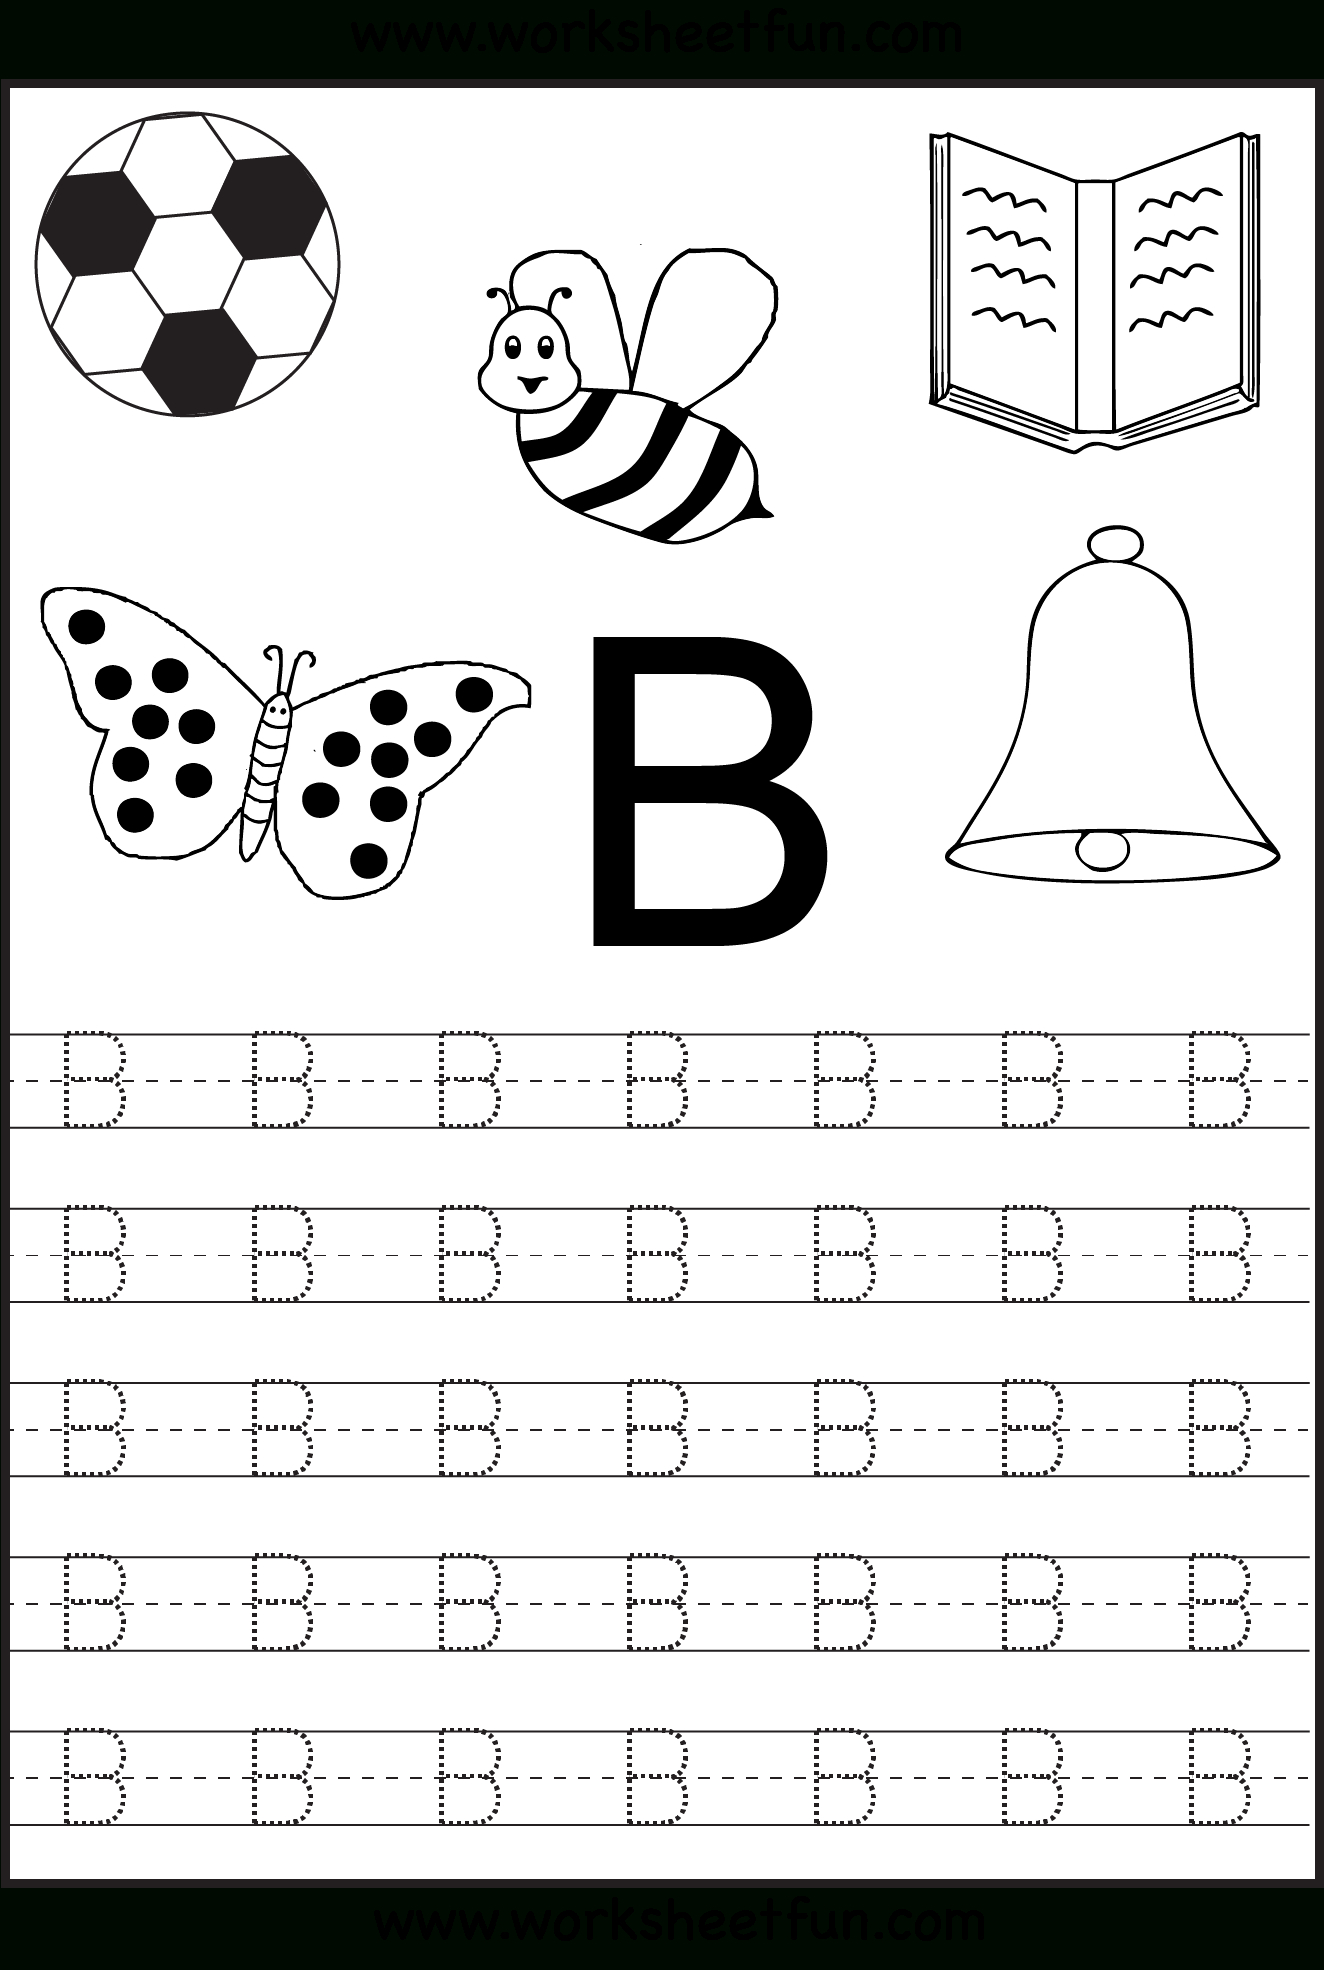 Free Printable Letter Tracing Worksheets For Kindergarten – 26 - Free Printable Tracing Letters And Numbers Worksheets